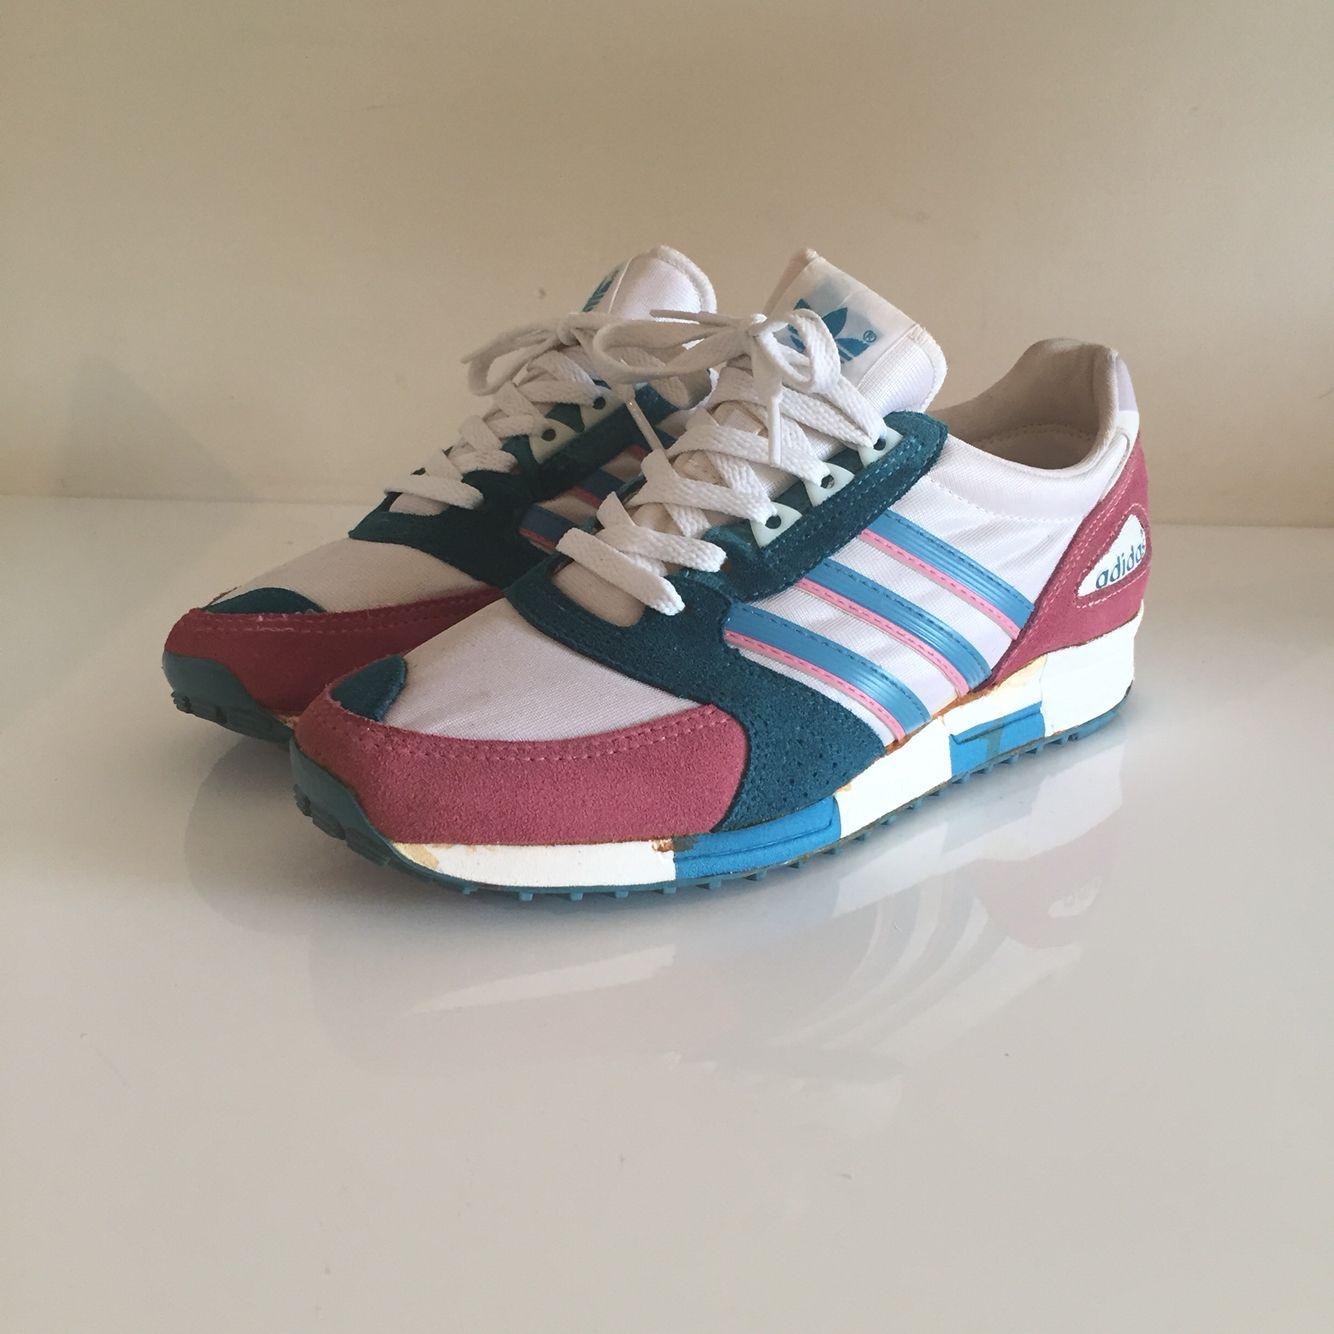 Adidas SneakersAdidas Ontario 1988Cool Adidas Kicks oCstQdxBhr